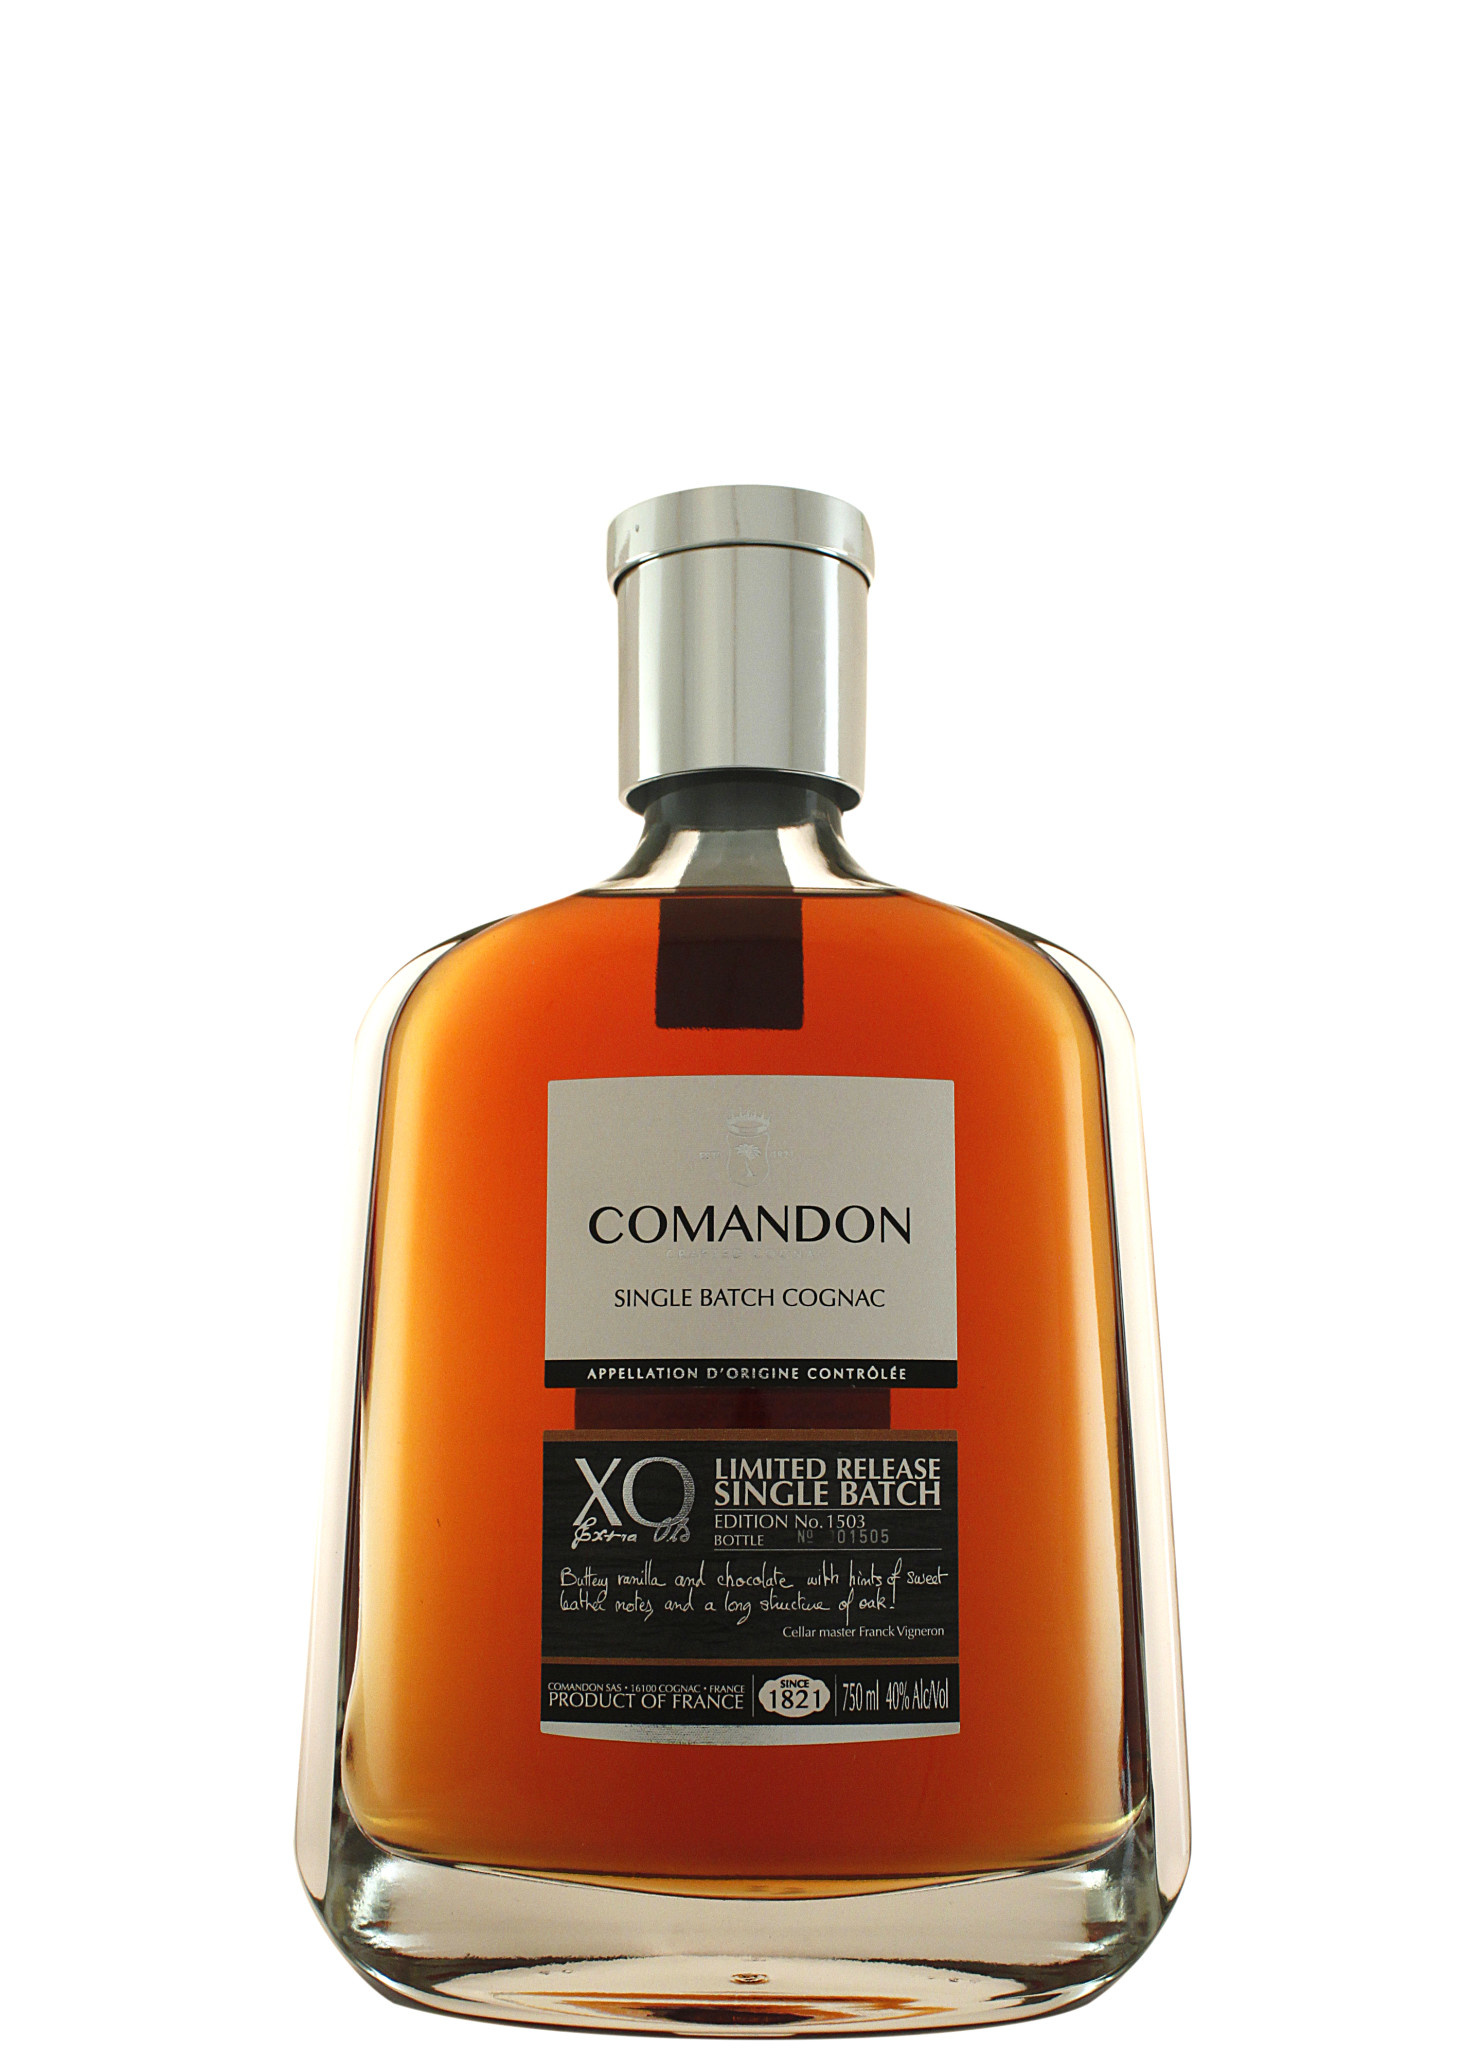 Comandon Cognac XO Extra Old Limited Release Single Batch